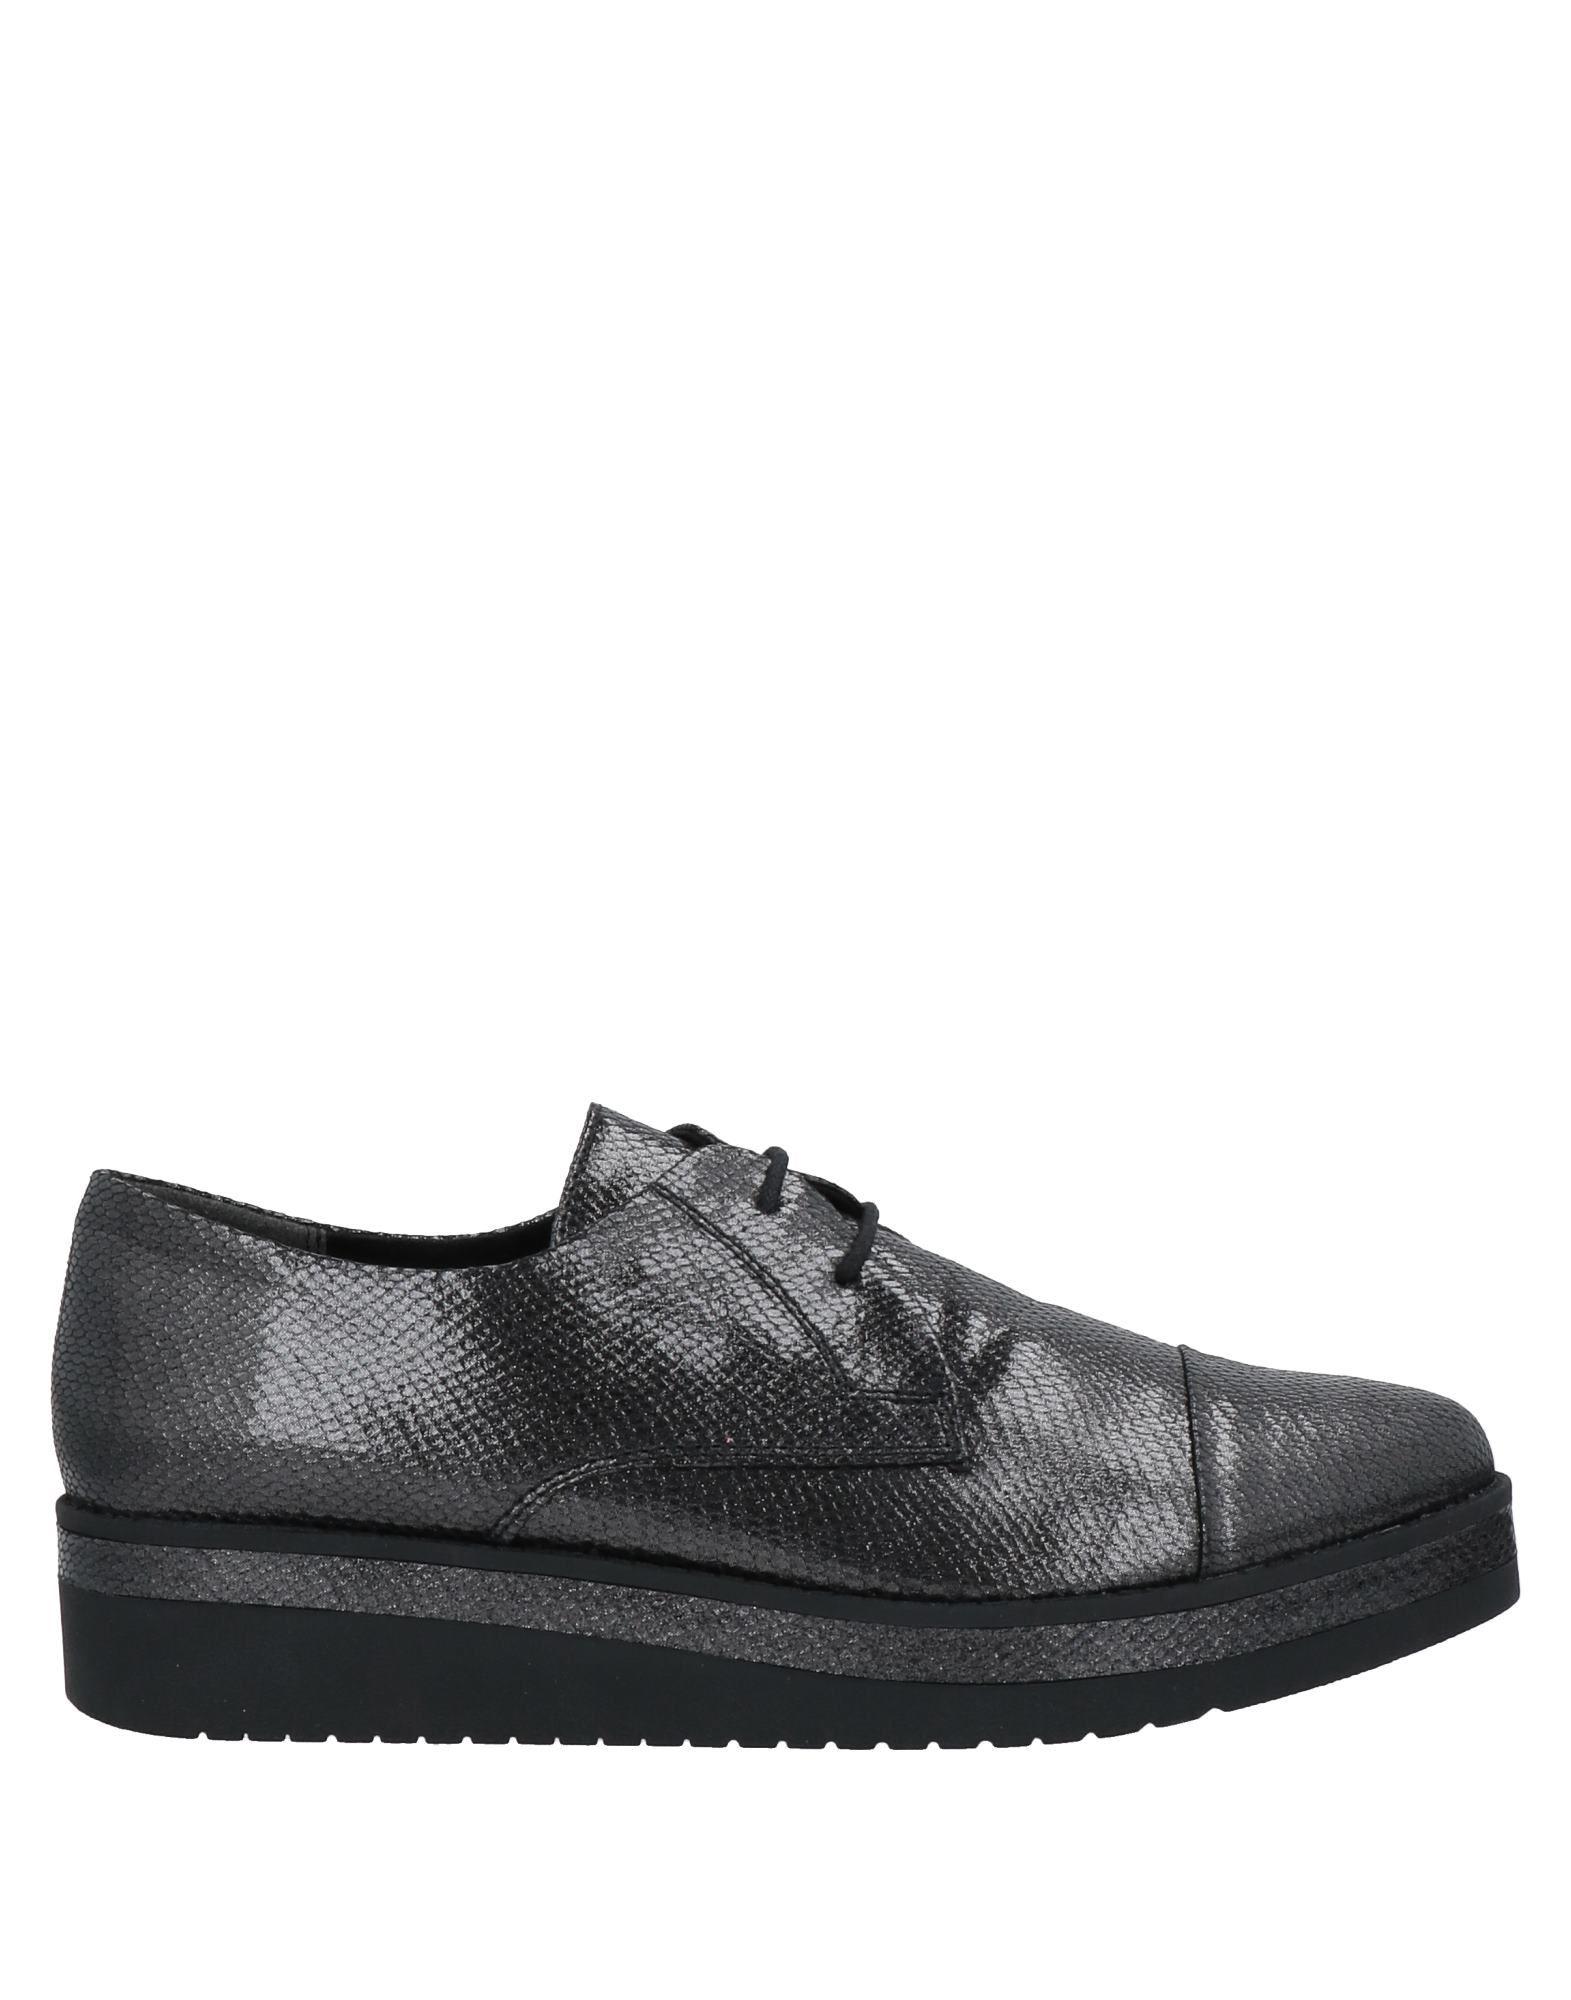 MARCO TOZZI Обувь на шнурках 11978145 фото